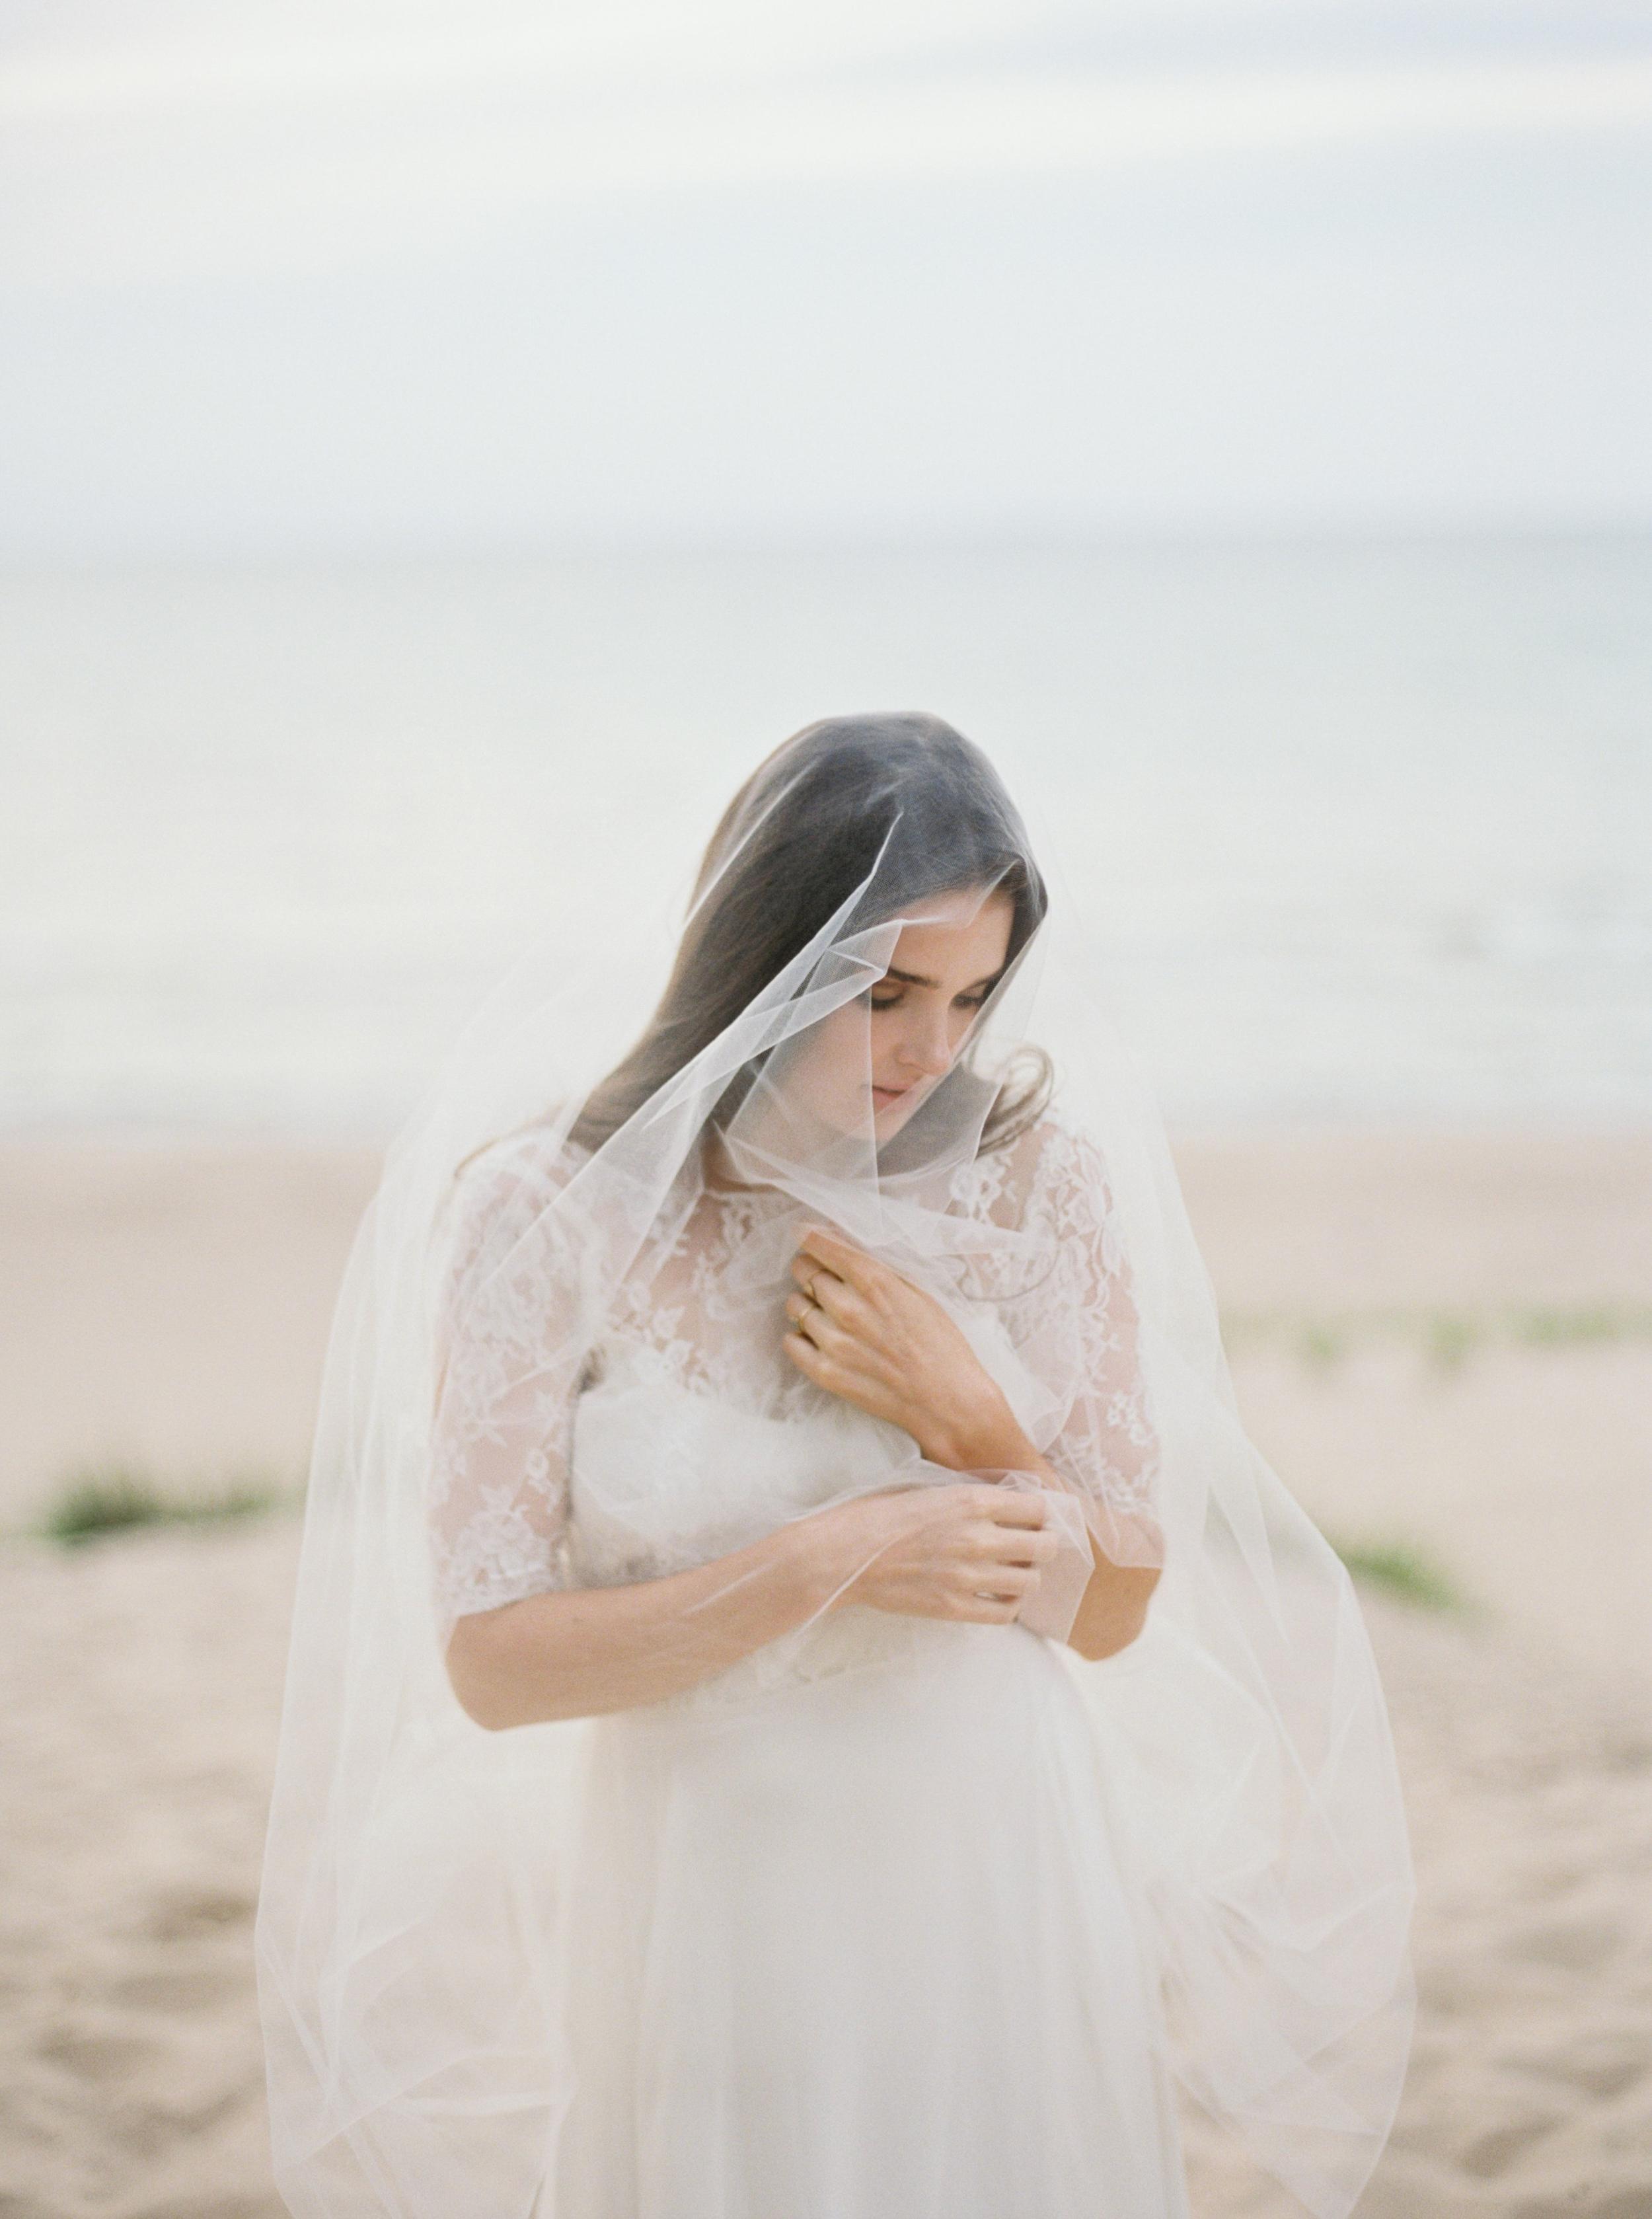 Kyle John l Fine Art Wedding Photography l Chicago, Copenhagen, California, New York, Destination l Blog l Jessica W_7